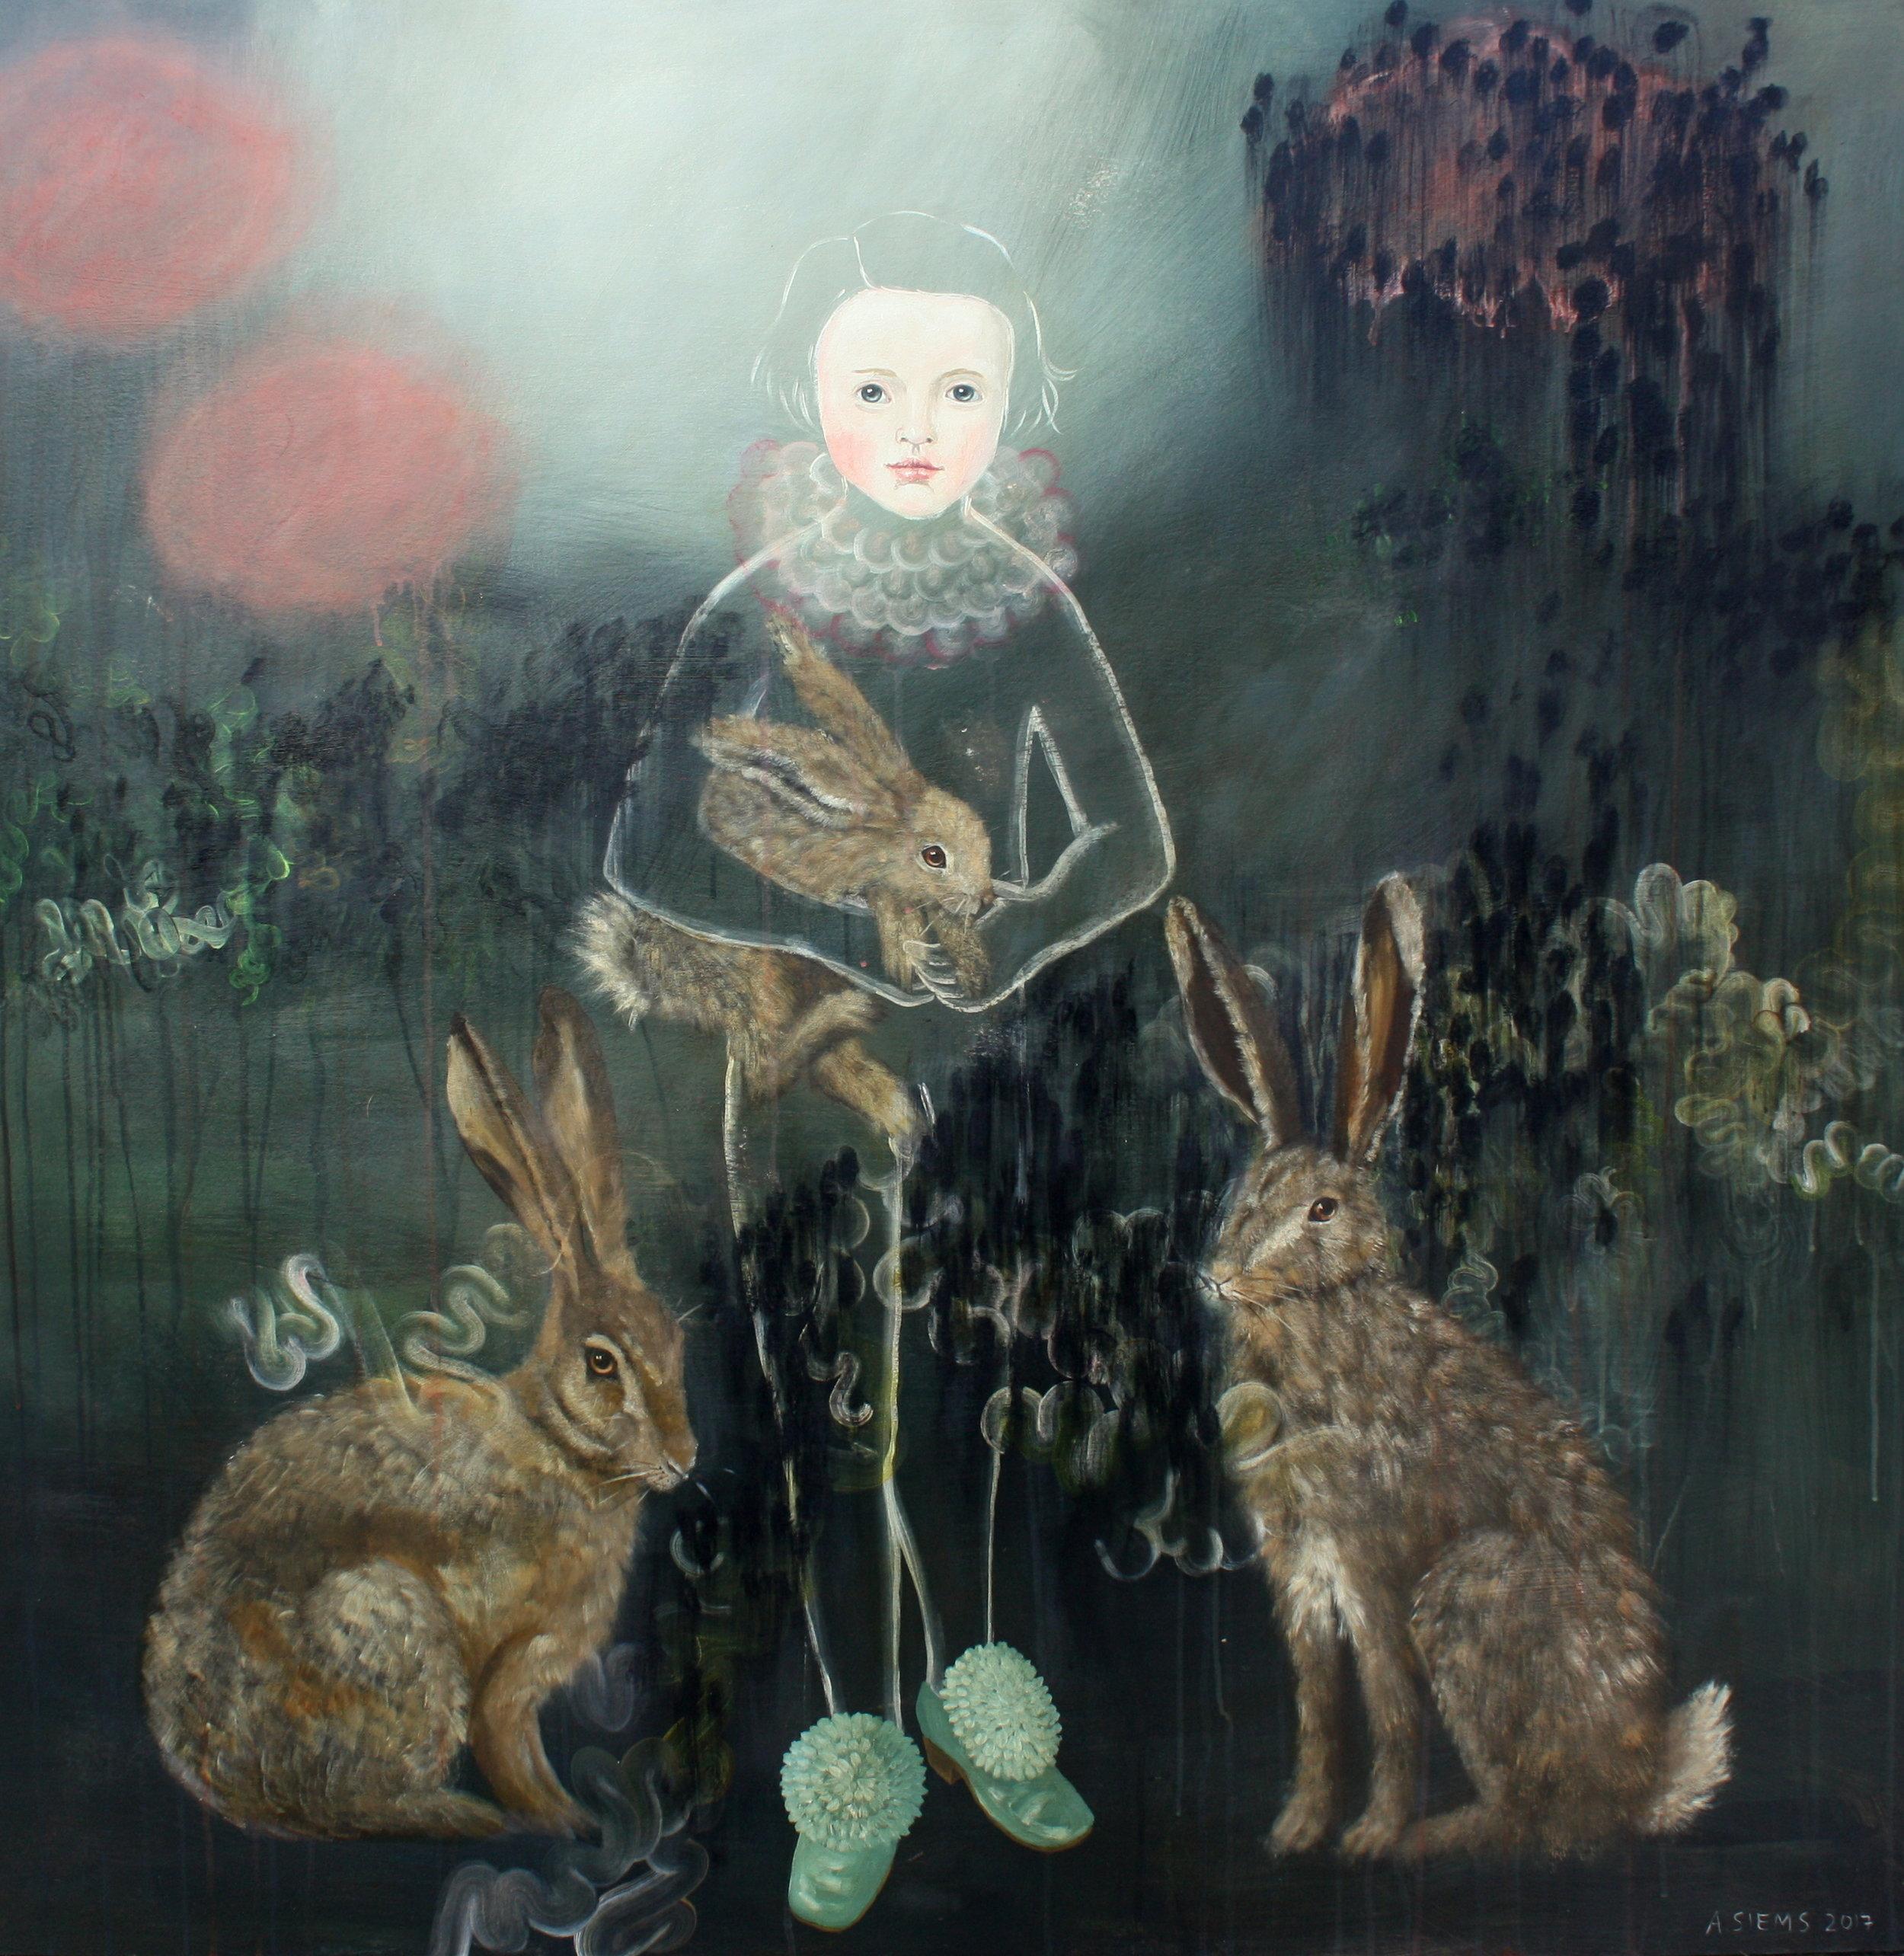 Rabbit Medicine, acrylic on prepared wood panel, 48x48